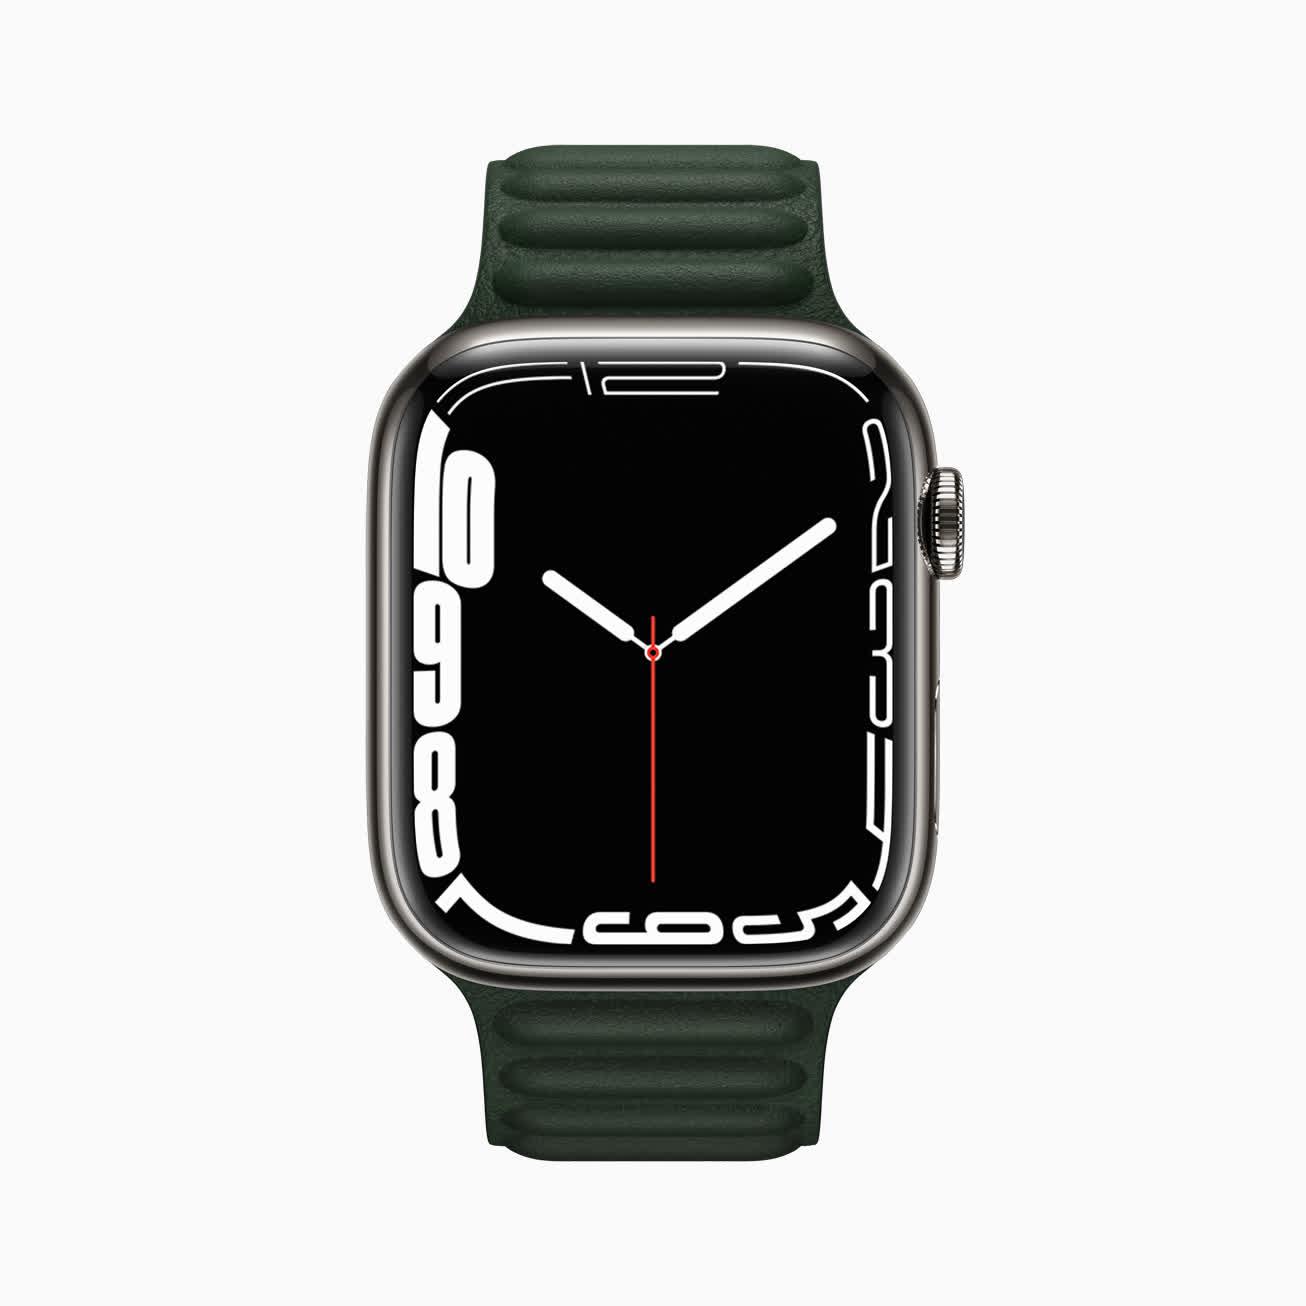 1631652486 879 LApple Watch Series 7 est plus grande plus courbee et